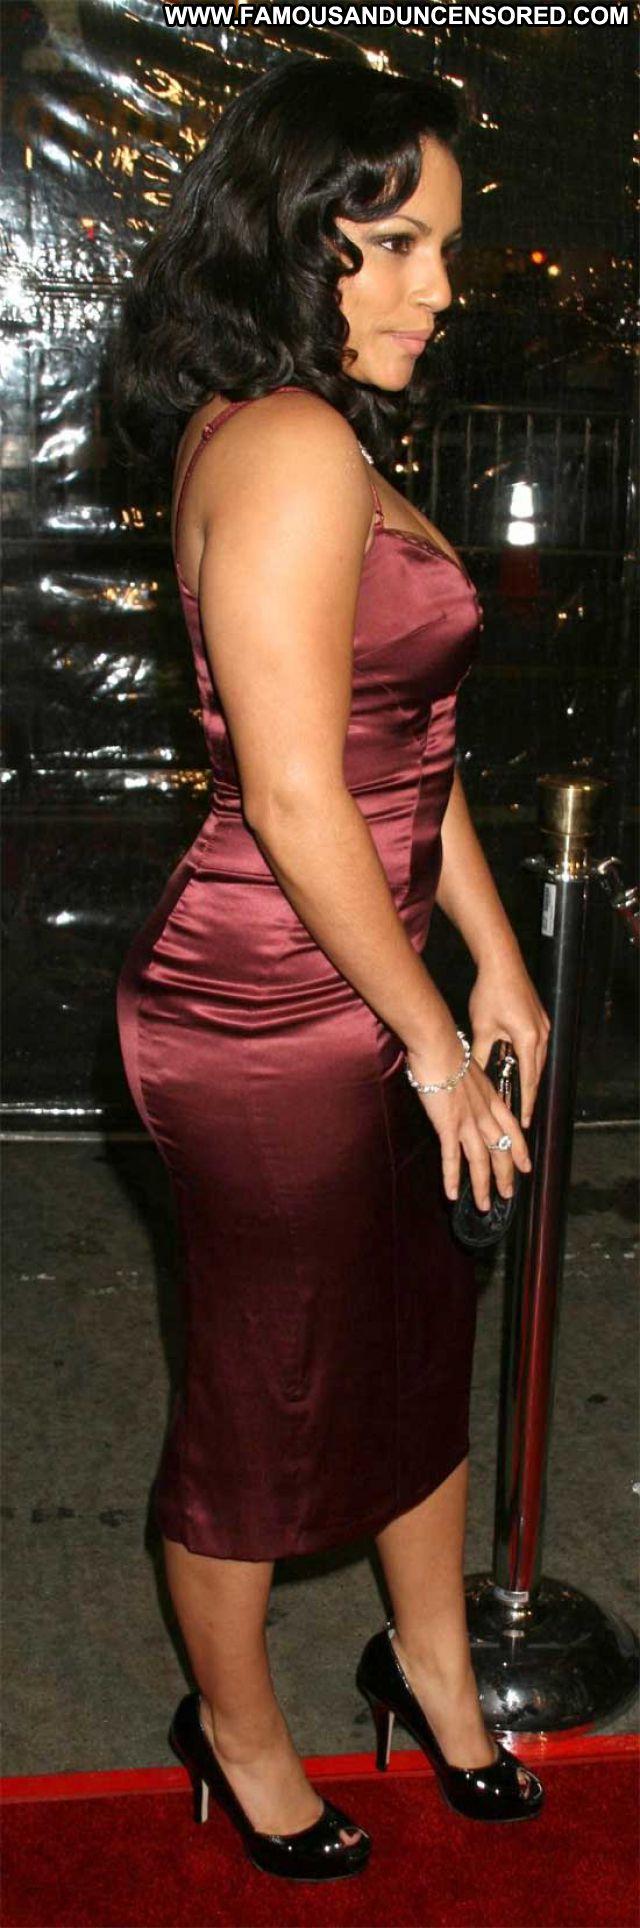 April Hernandez No Source Babe Ass Posing Hot Celebrity Big Ass